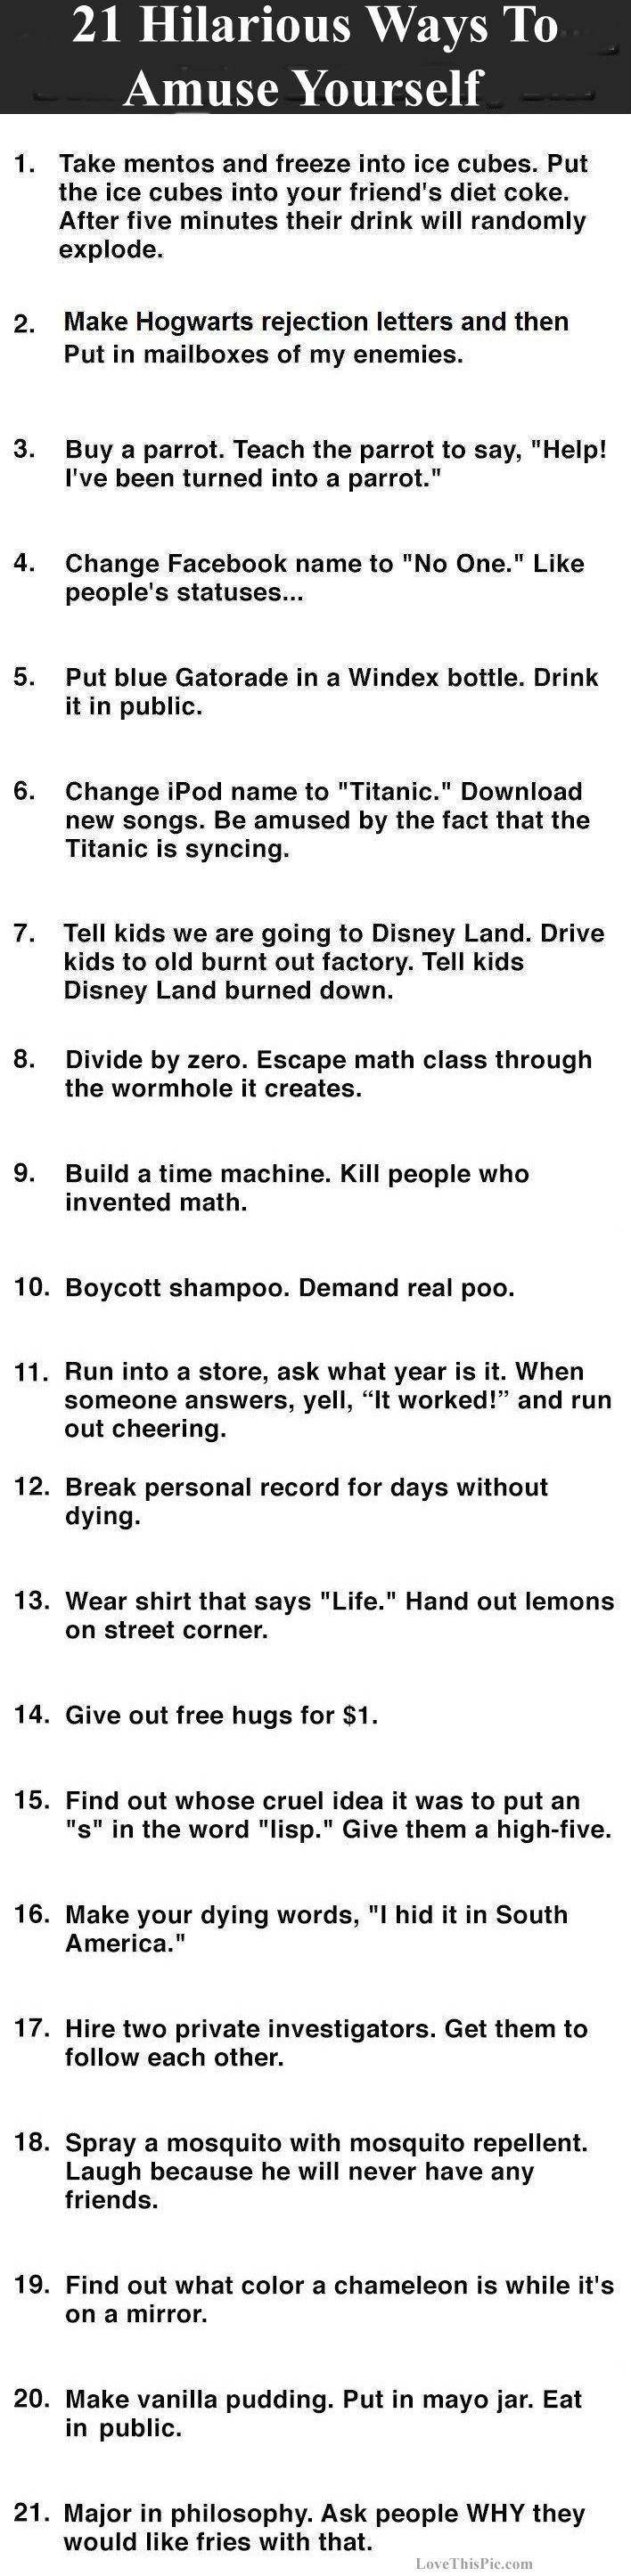 21 Hilarious Ways To Amuse Yourself funny jokes lol funny quote funny quotes funny sayings joke humor funny jokes amusing